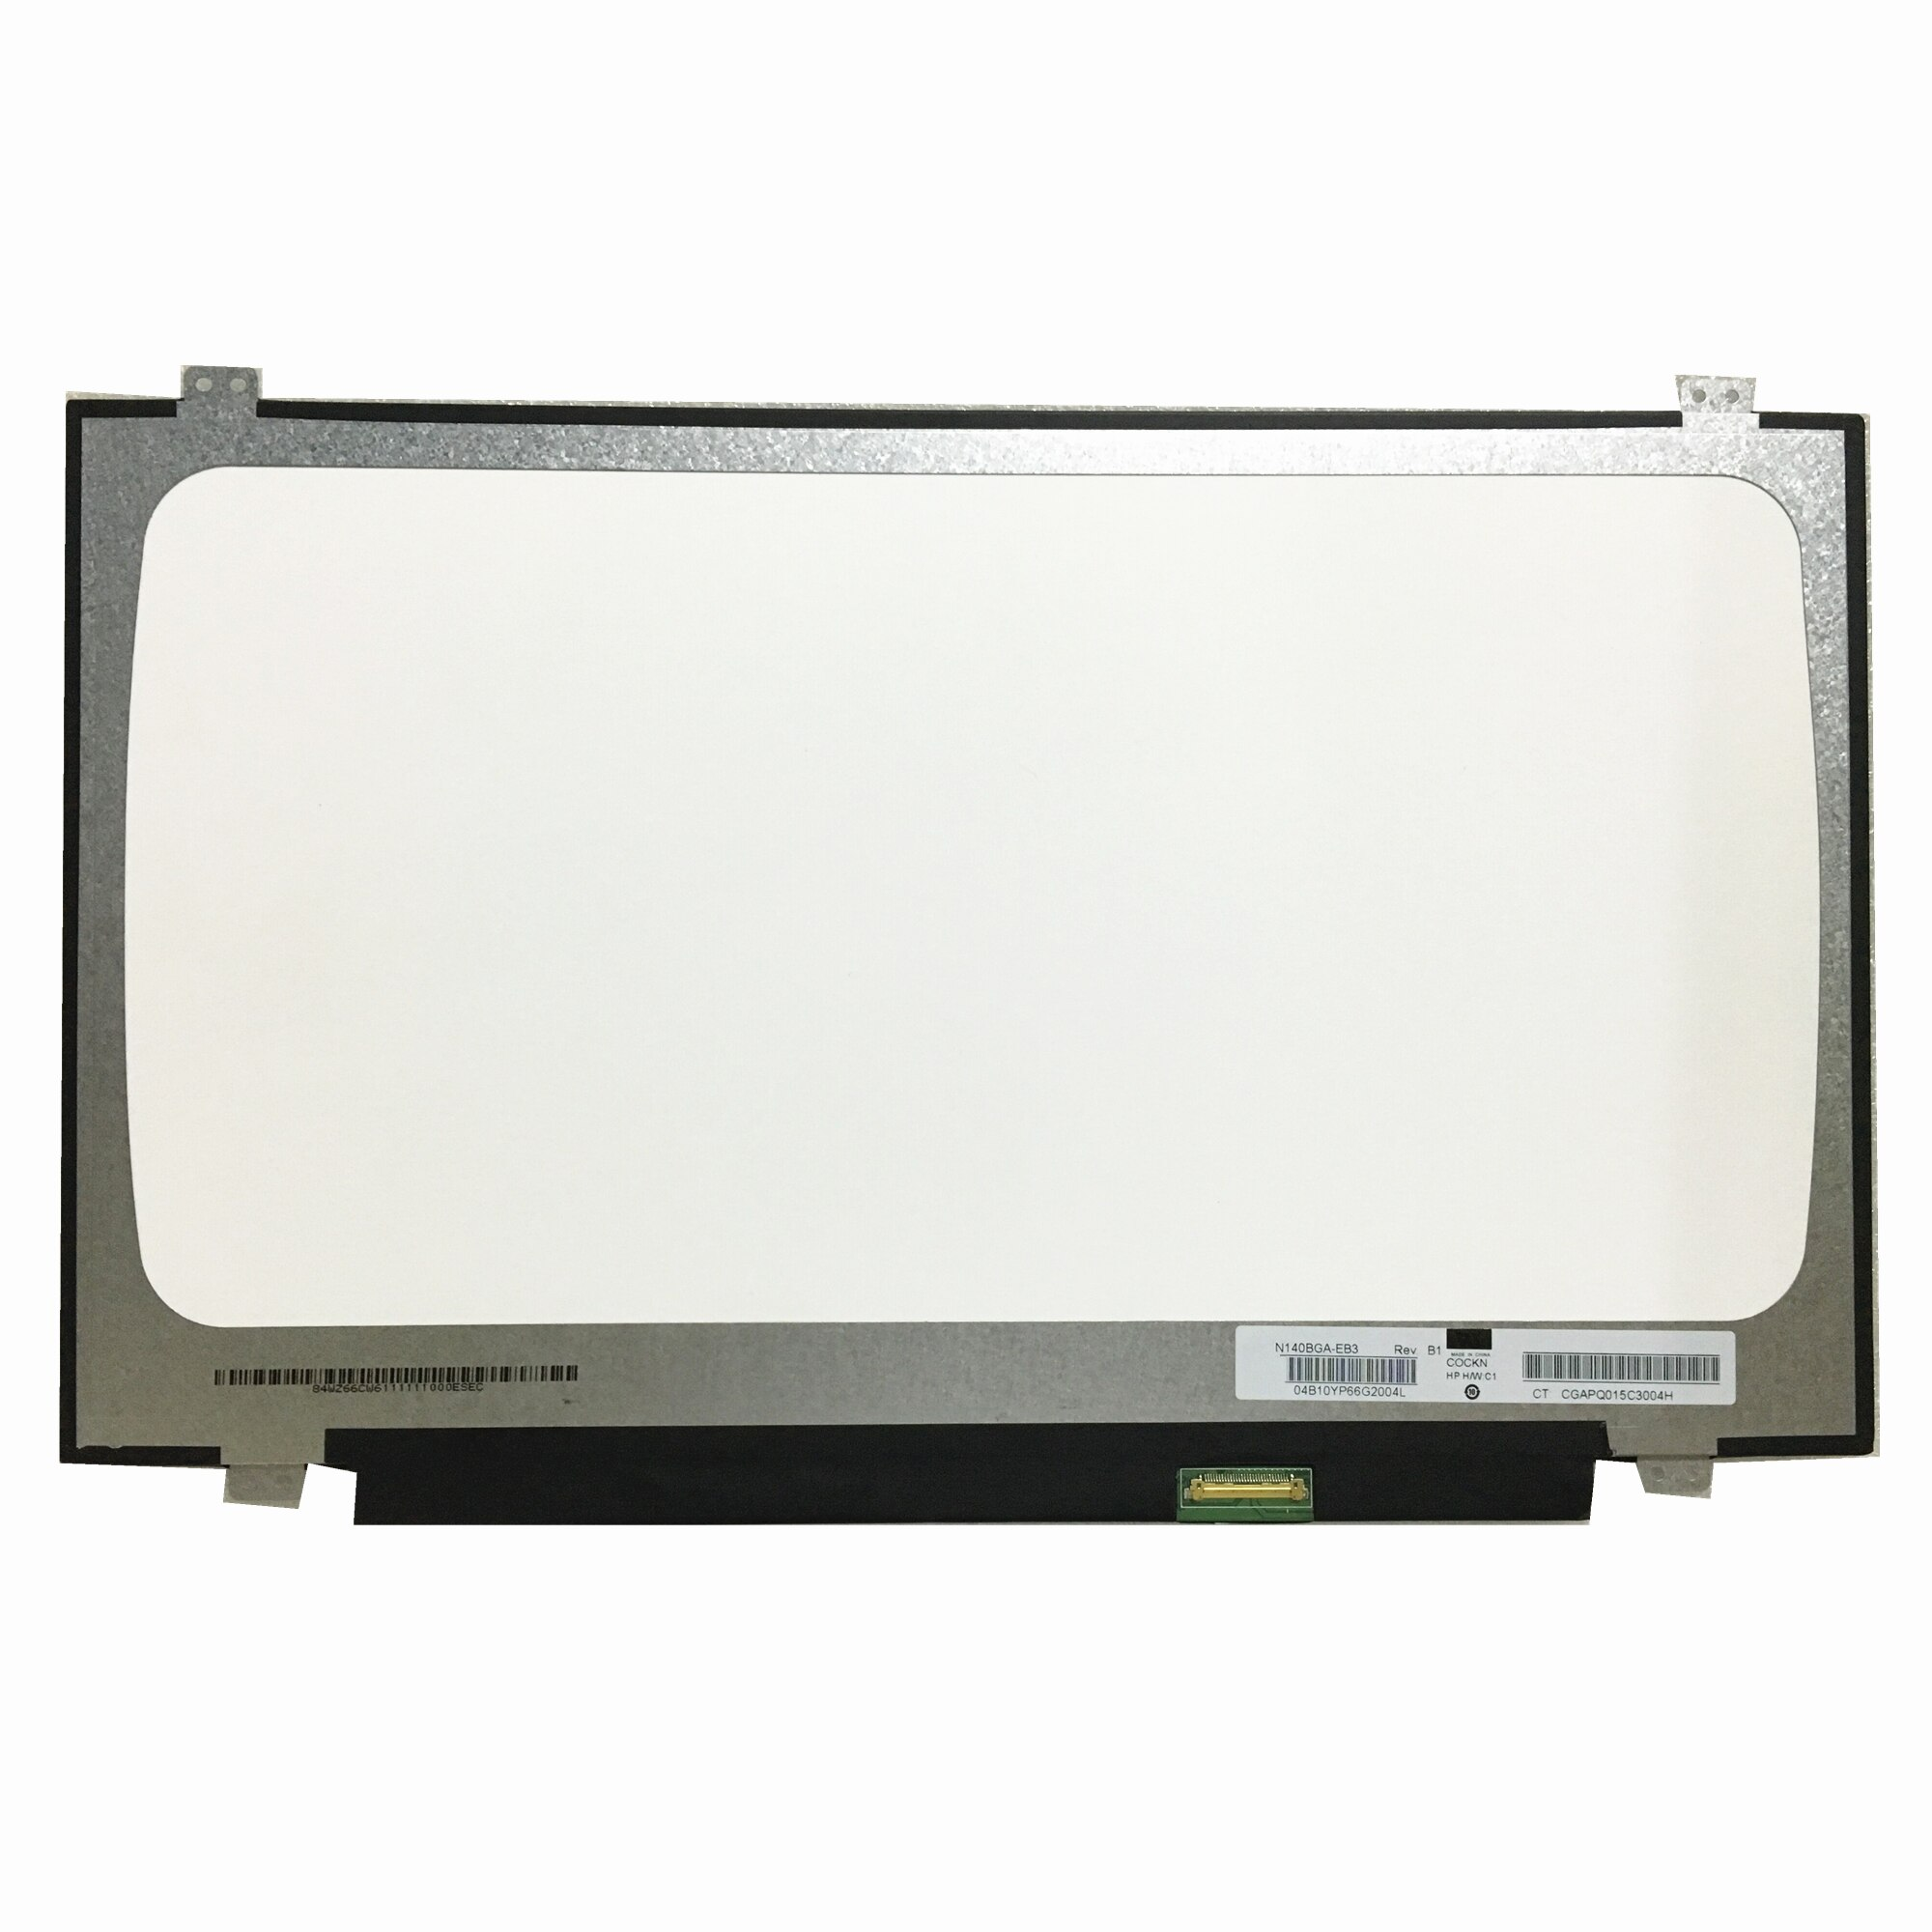 Бесплатная доставка, флейта N140BGA EB3 N140BGE EB4, подходит для ноутбука Aecr Aspire 1, флейта серии N17Q4, ЖК-экран, 30 контактов